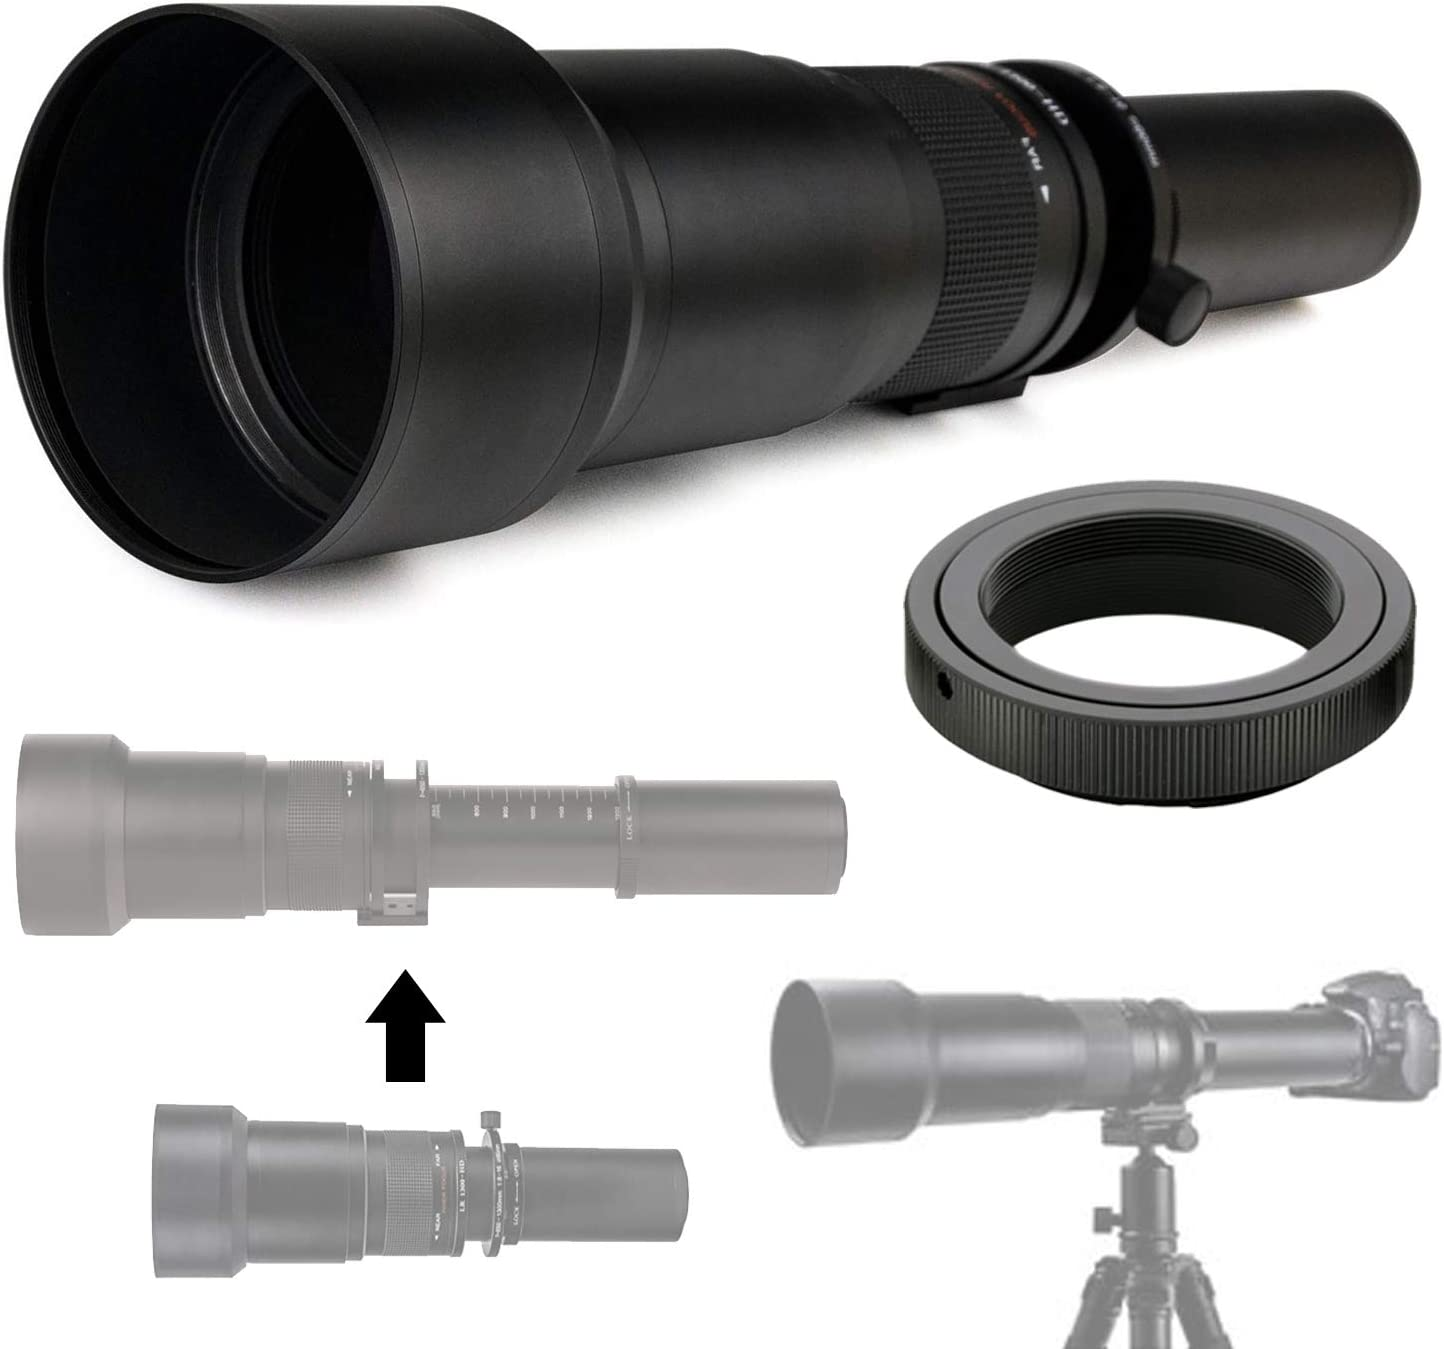 Commander Optics 650-1300mm f 8-16 HD Fashionable for Zoom Ca Lens Detroit Mall Telephoto